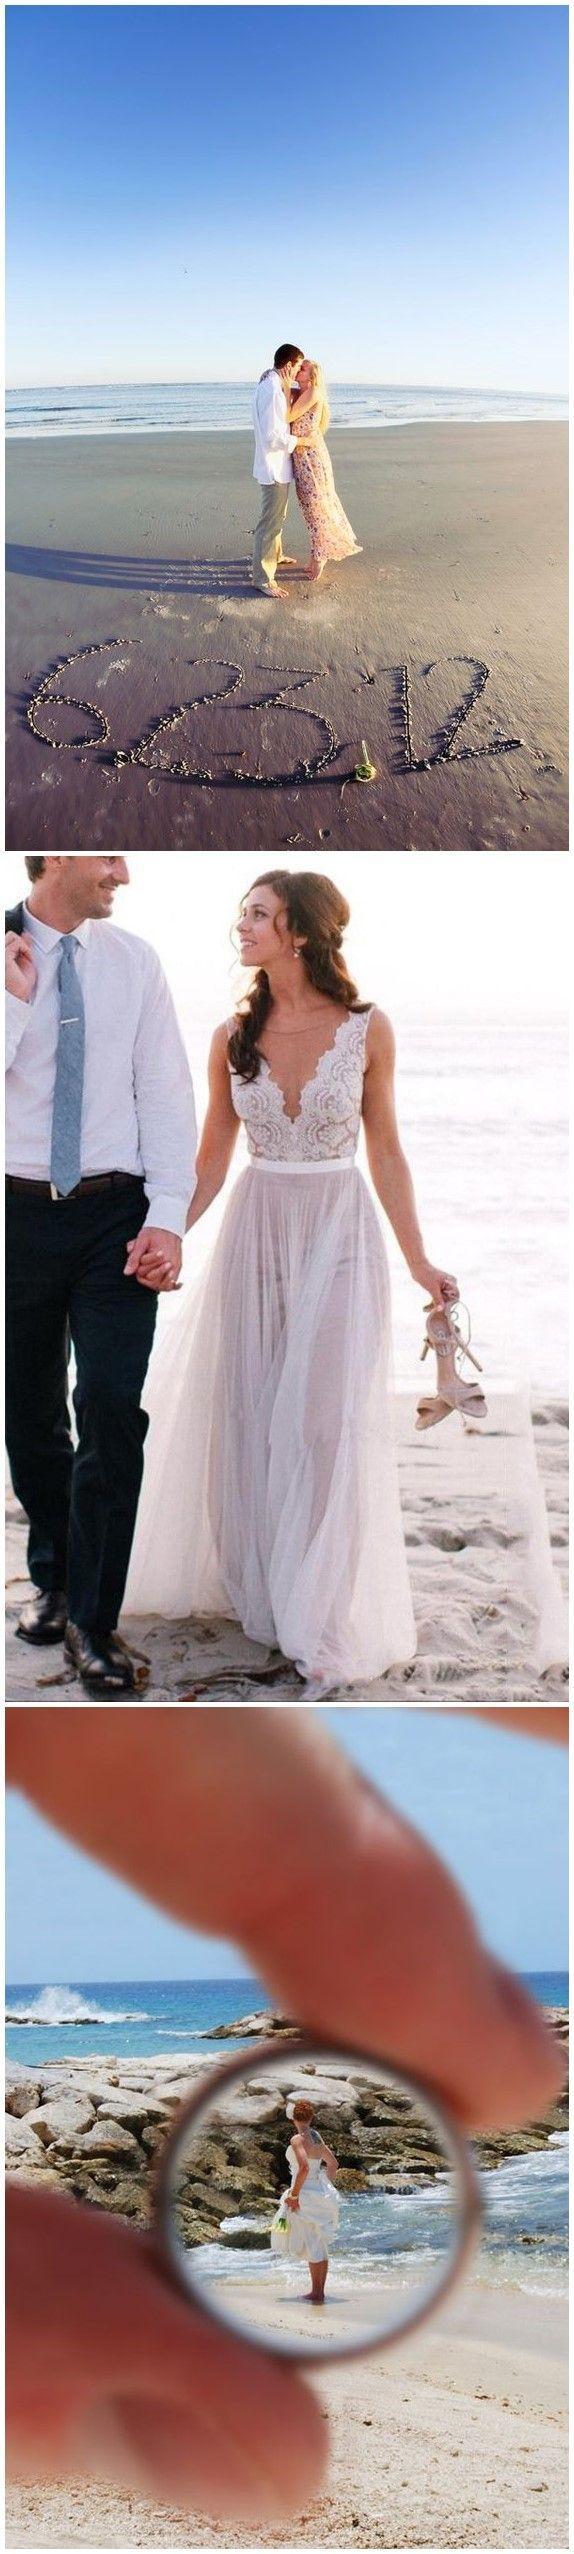 dreamy and creative beach wedding ideas beach weddings